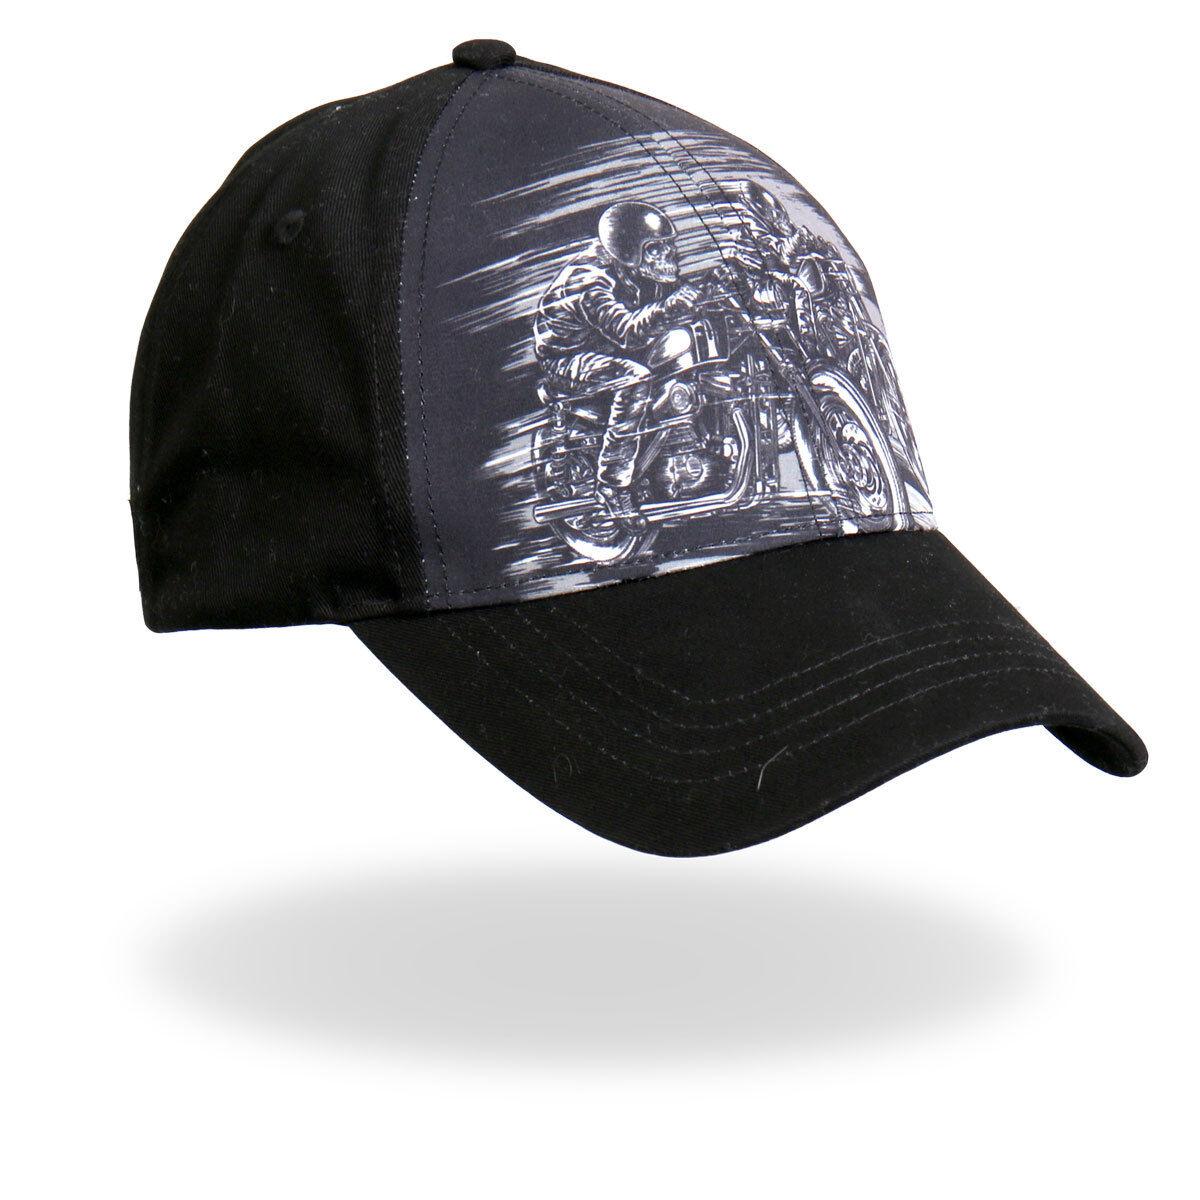 Skull Riders Black Motorcycle Skeletons Riding Fast Black Riders Grey Gray Biker Ball Cap b4e108